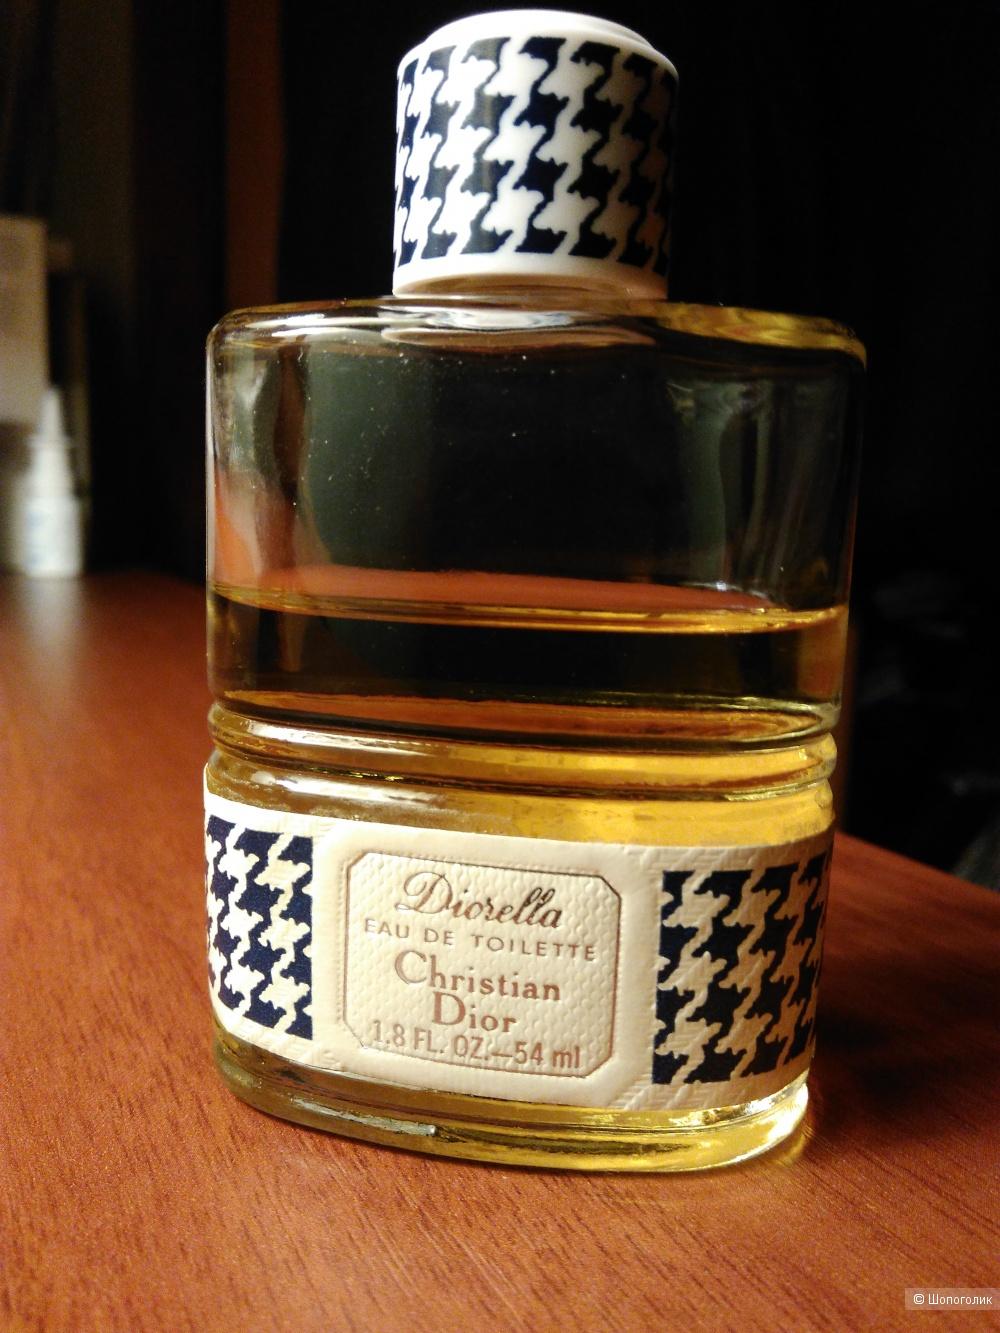 Diorella Christian Dior EDT от 54 мл